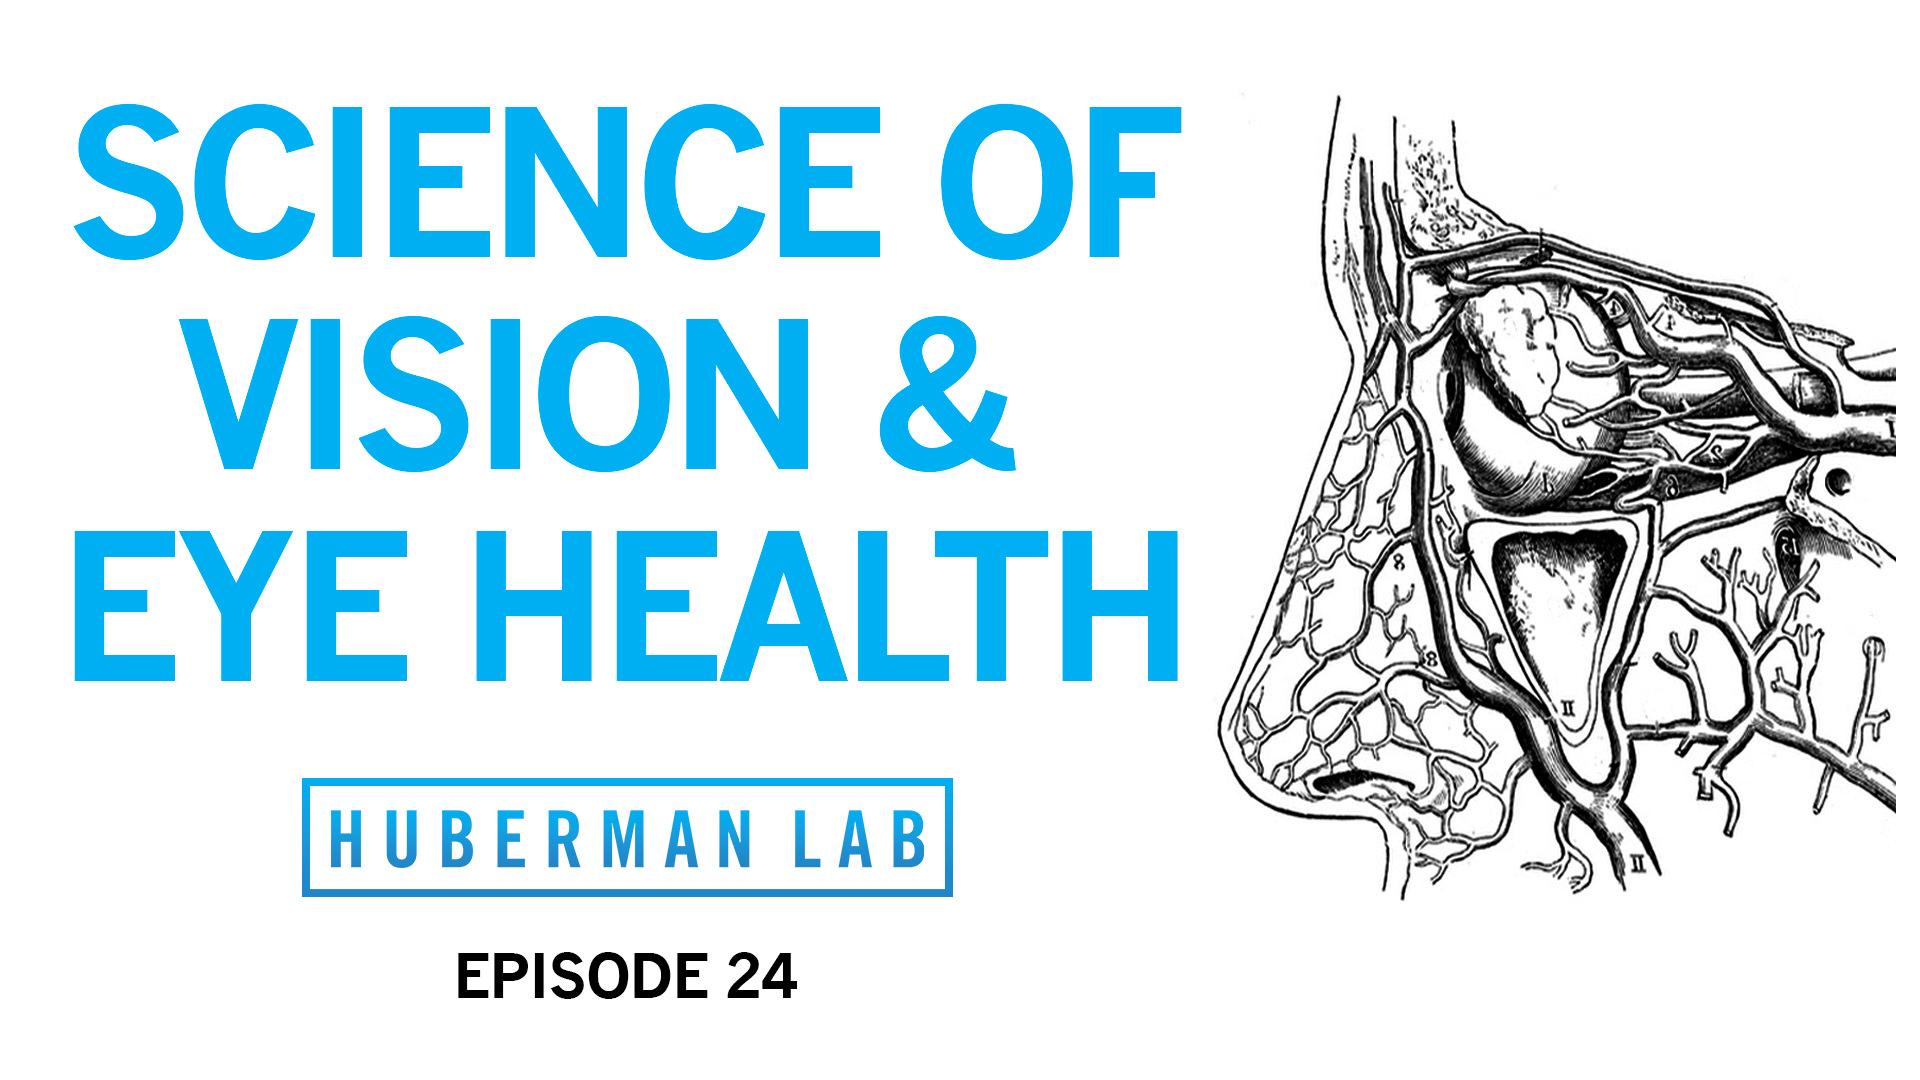 Huberman Lab Podcast Episode 24 Title Card